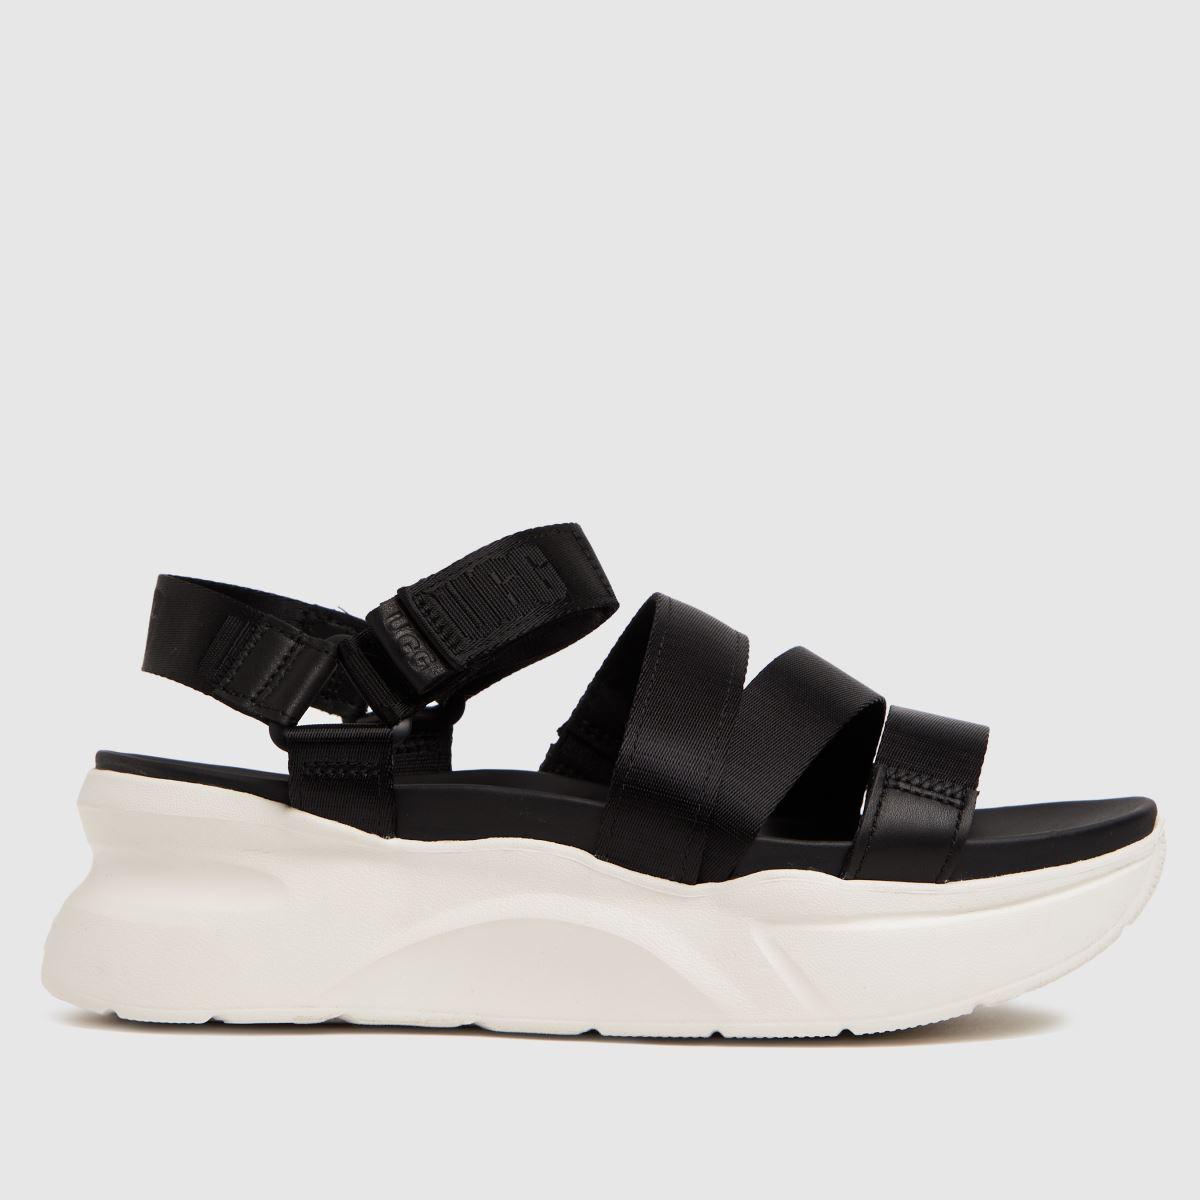 UGG Black & White La Shores Sandals